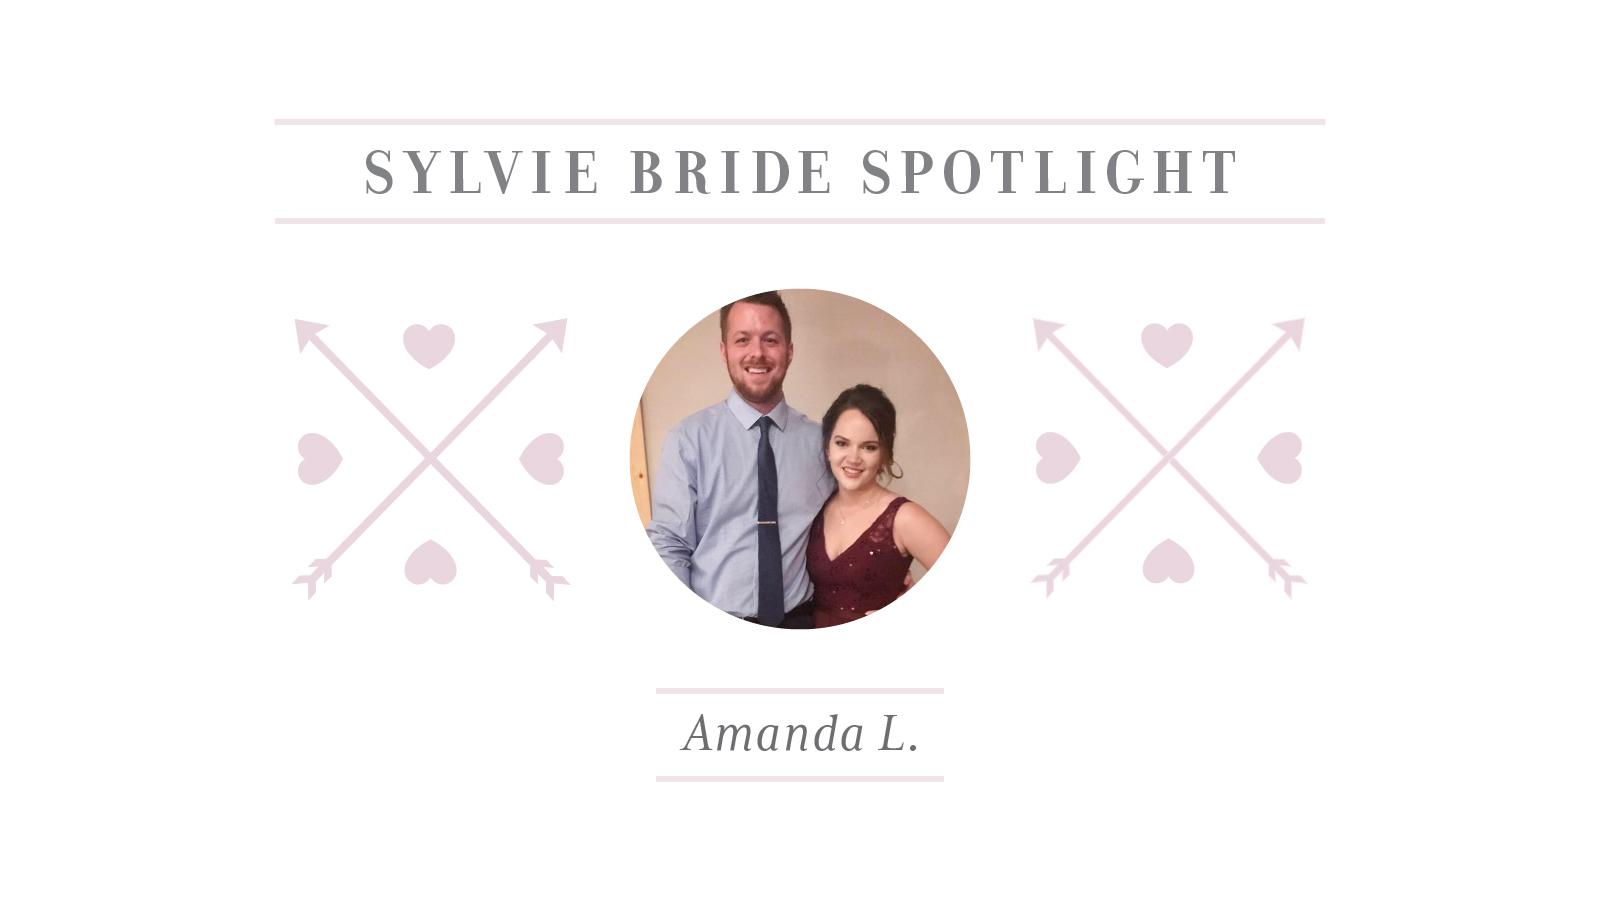 Sylvie Bride Spotlight - AmandaL